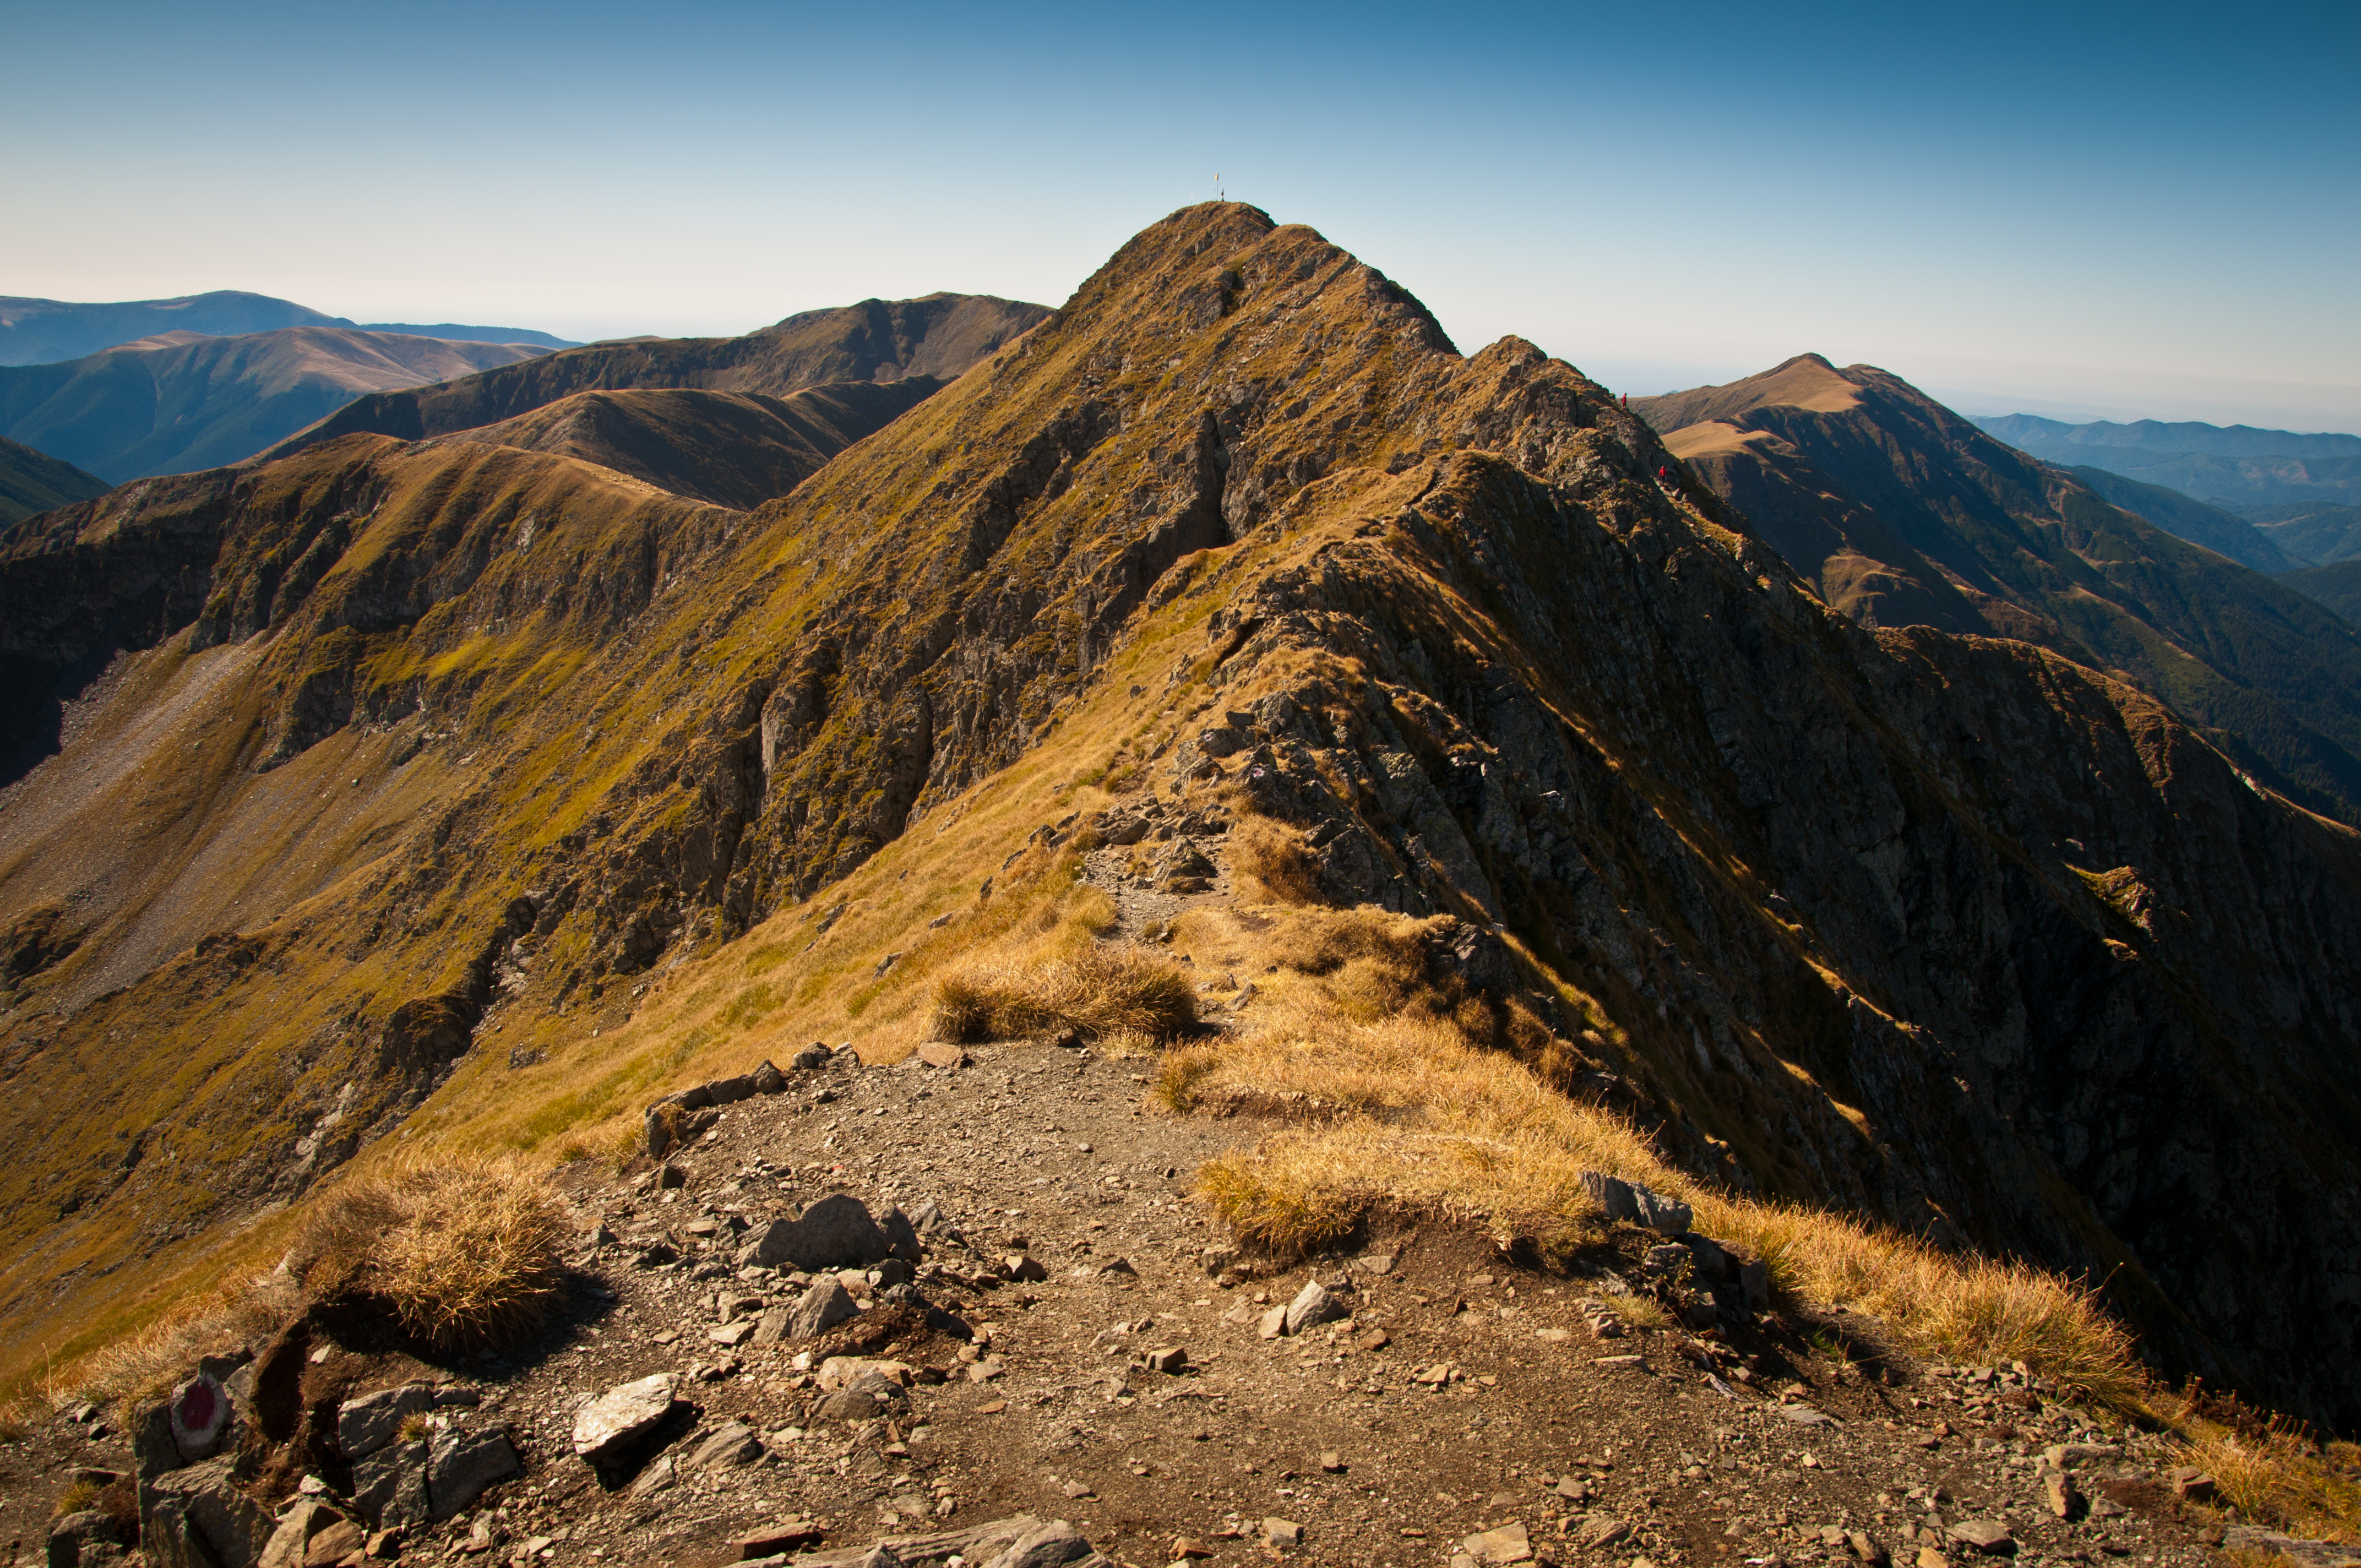 Atop the Ridge